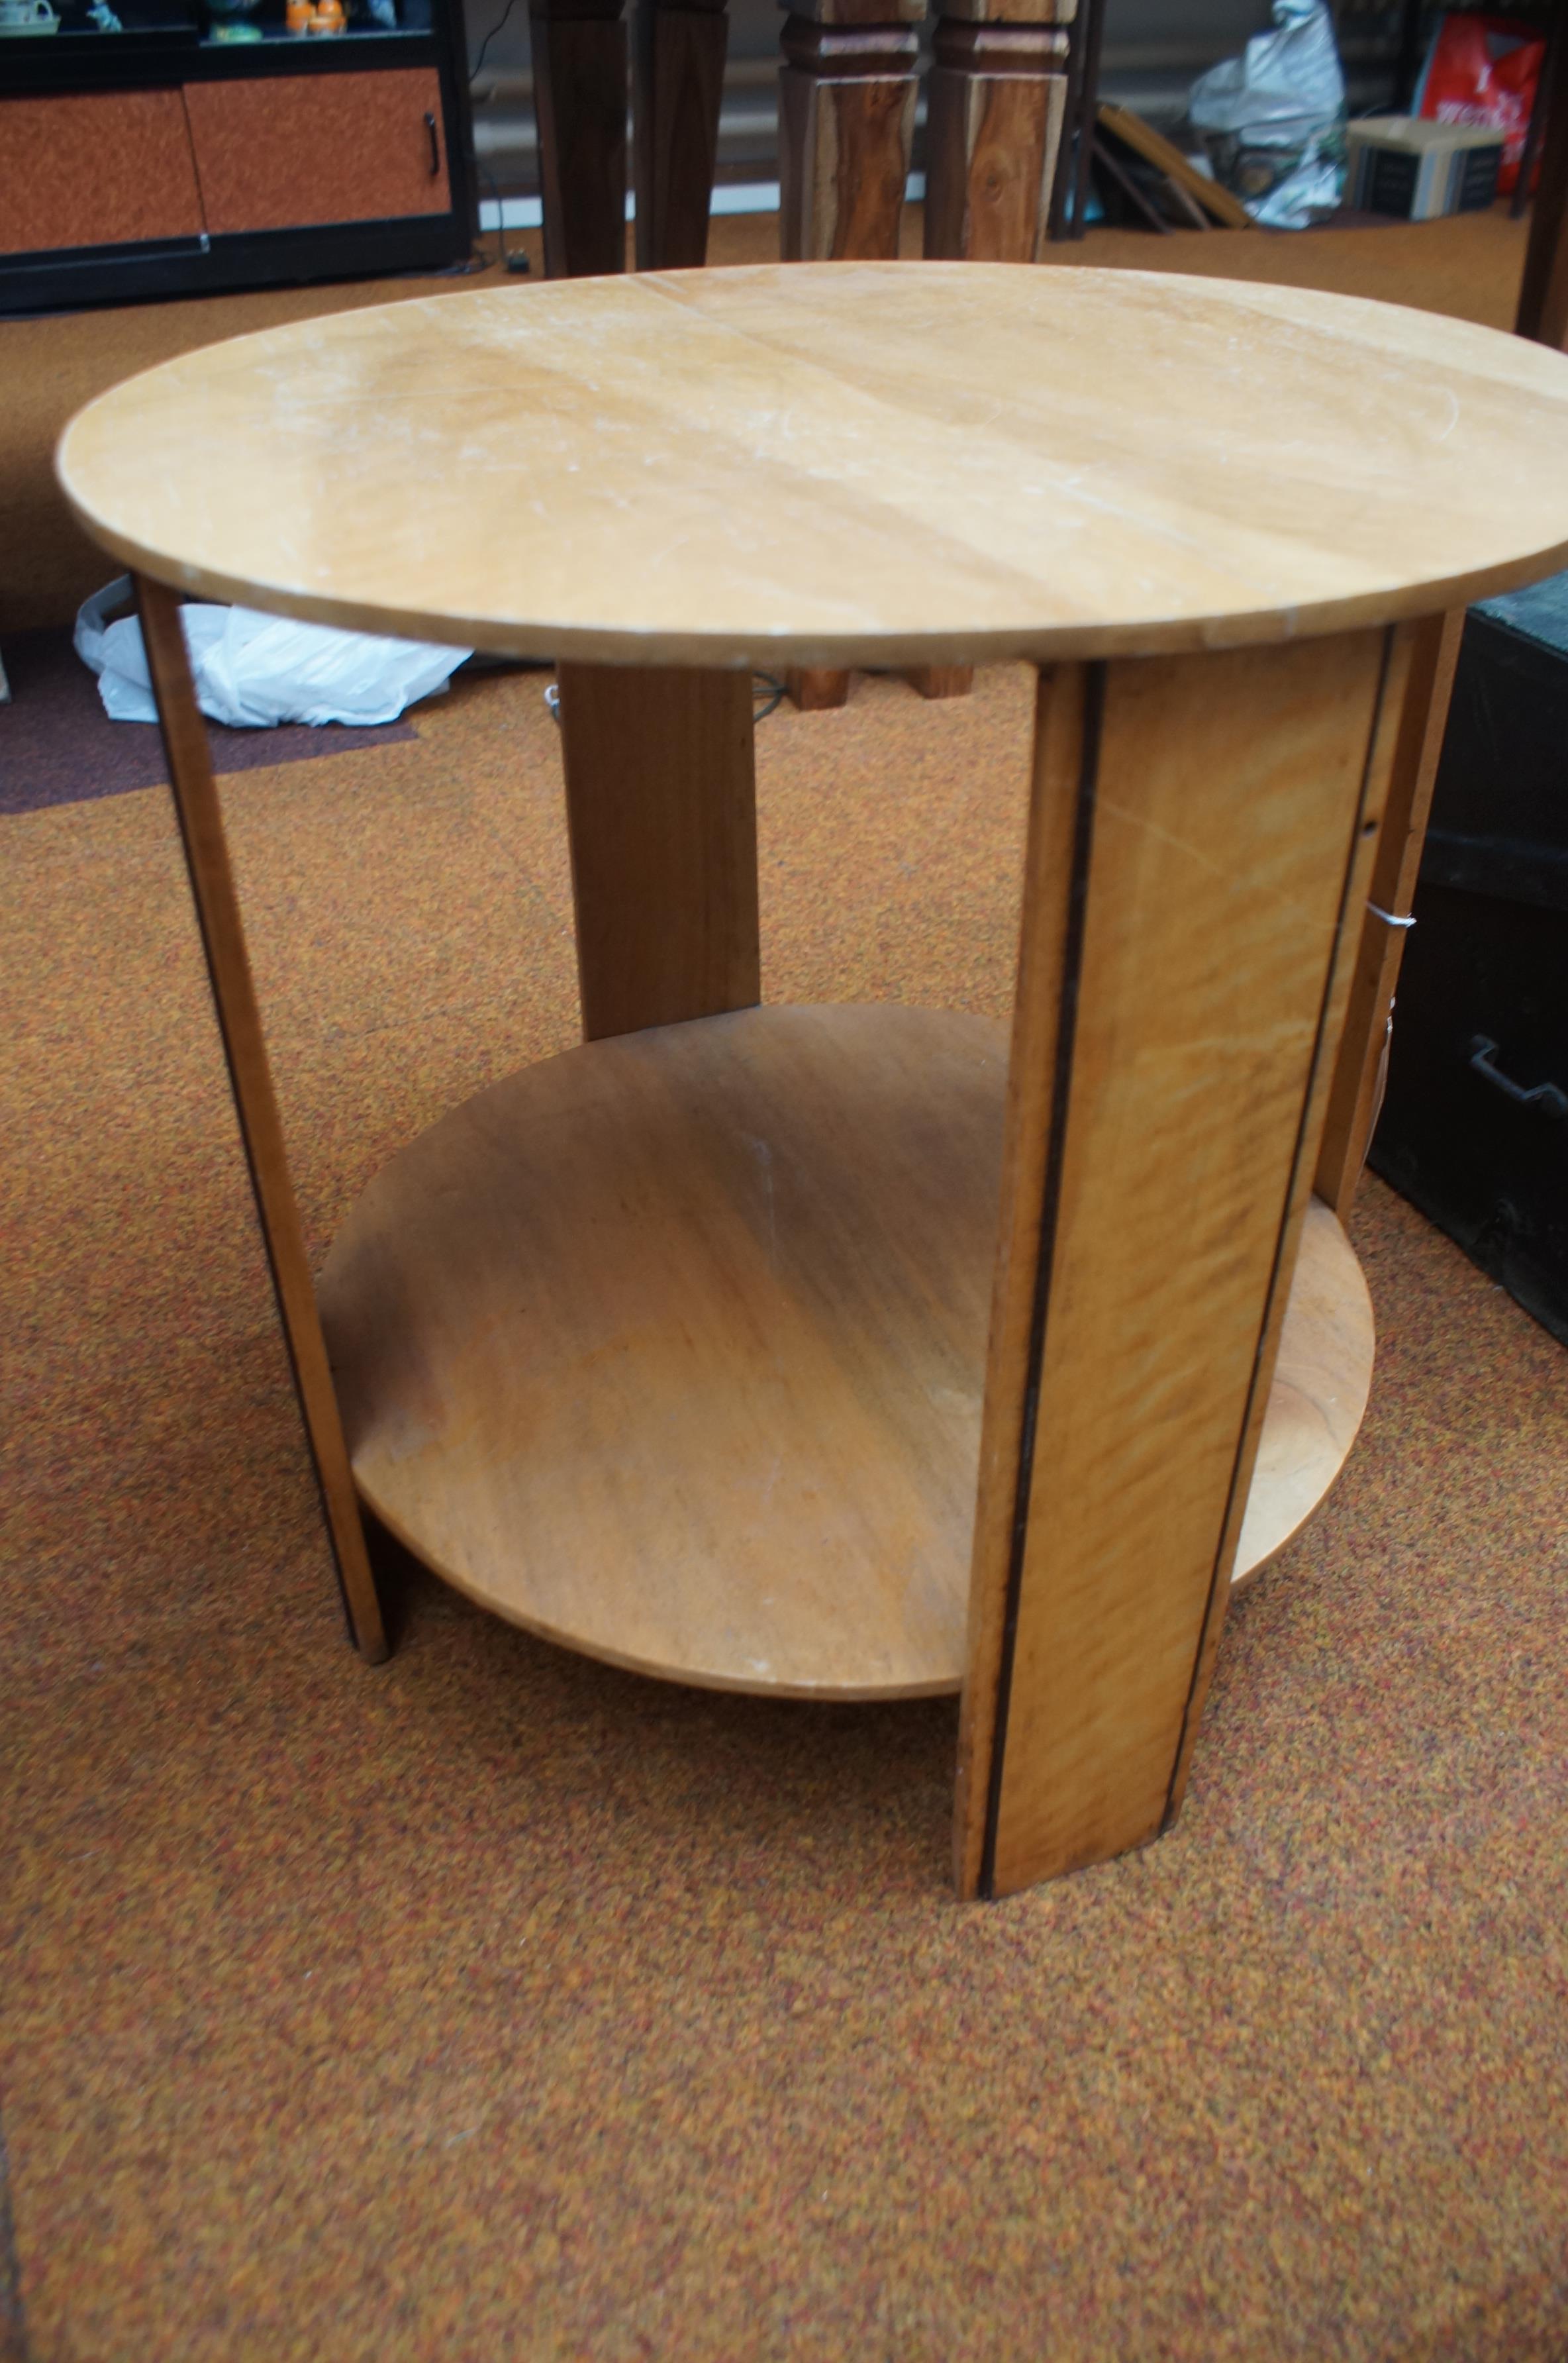 Lot 181 - Retro mid century coffee table